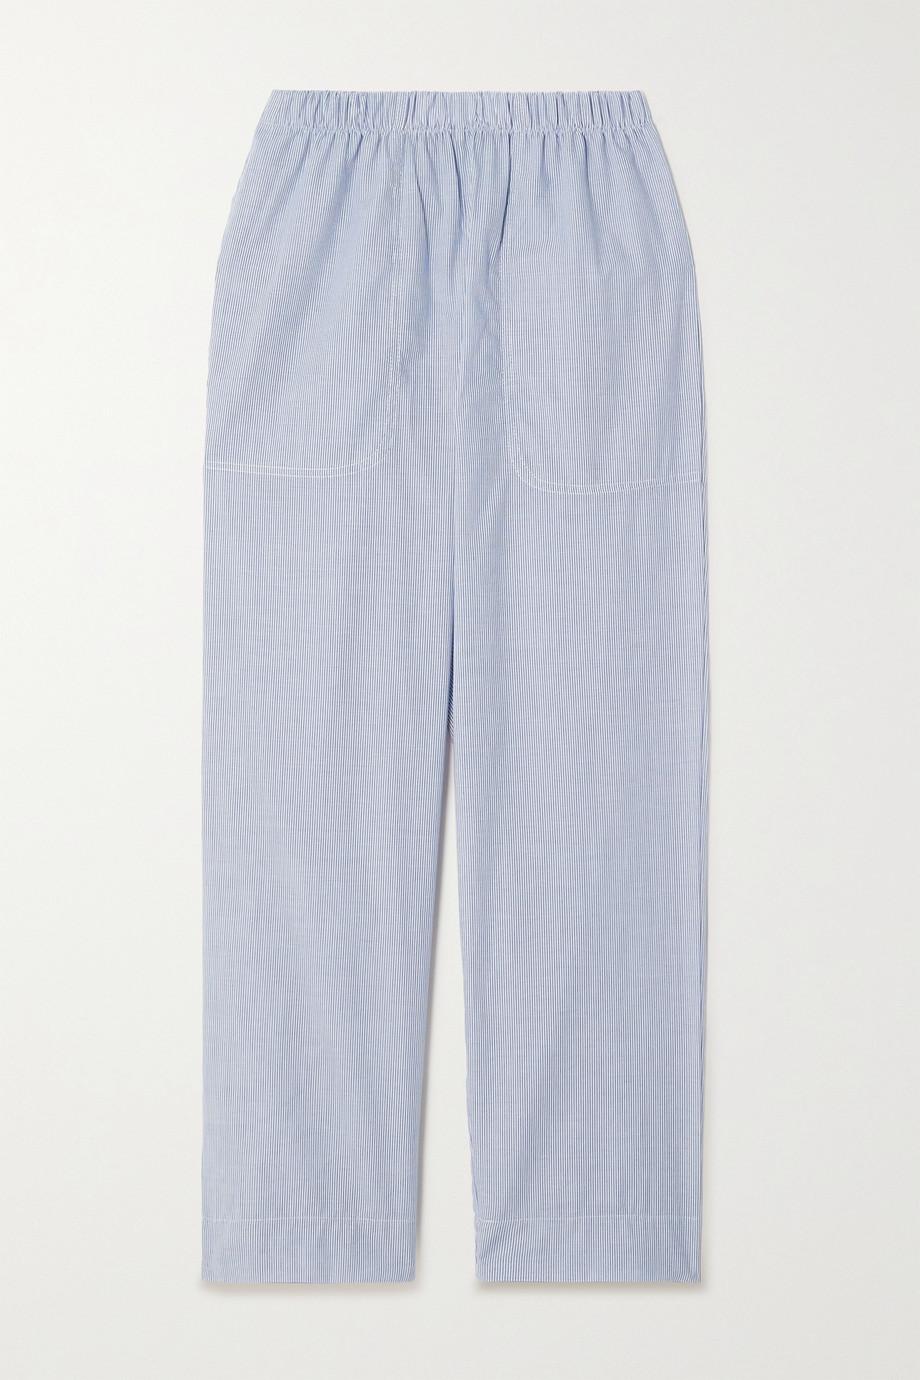 LESET Eve Pyjama-Hose aus gestreifter Baumwollpopeline